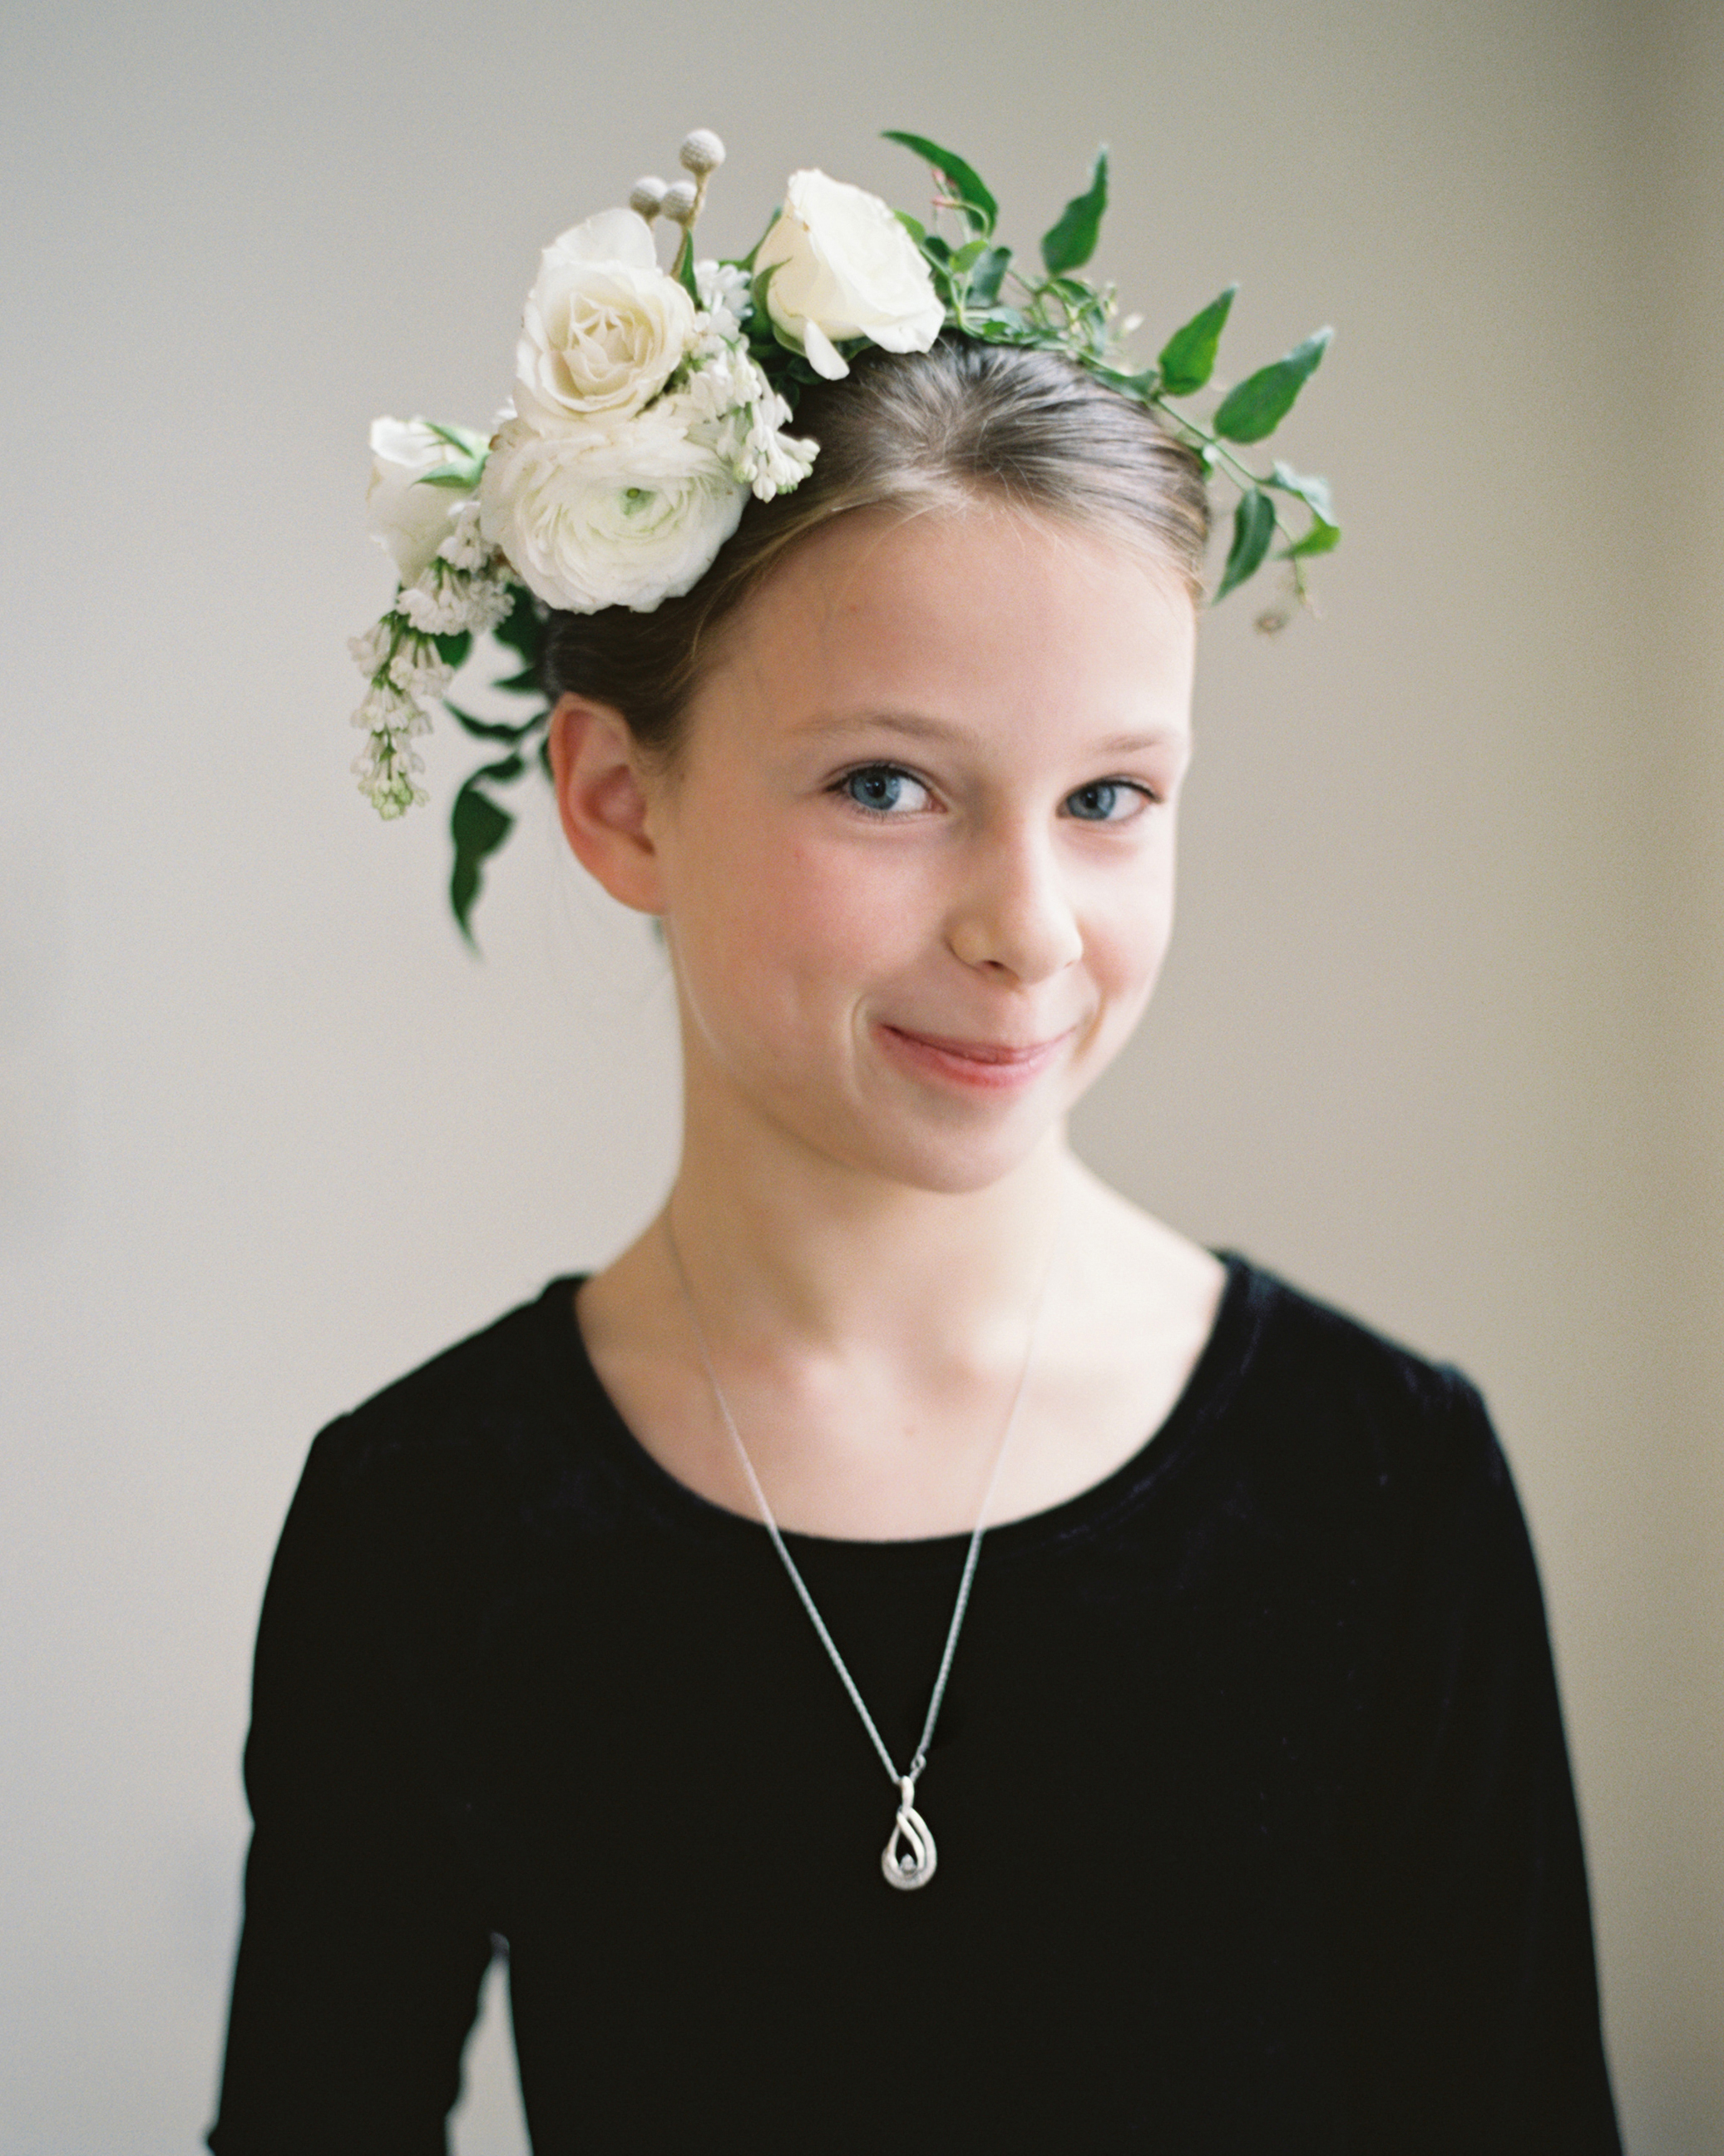 coleen-brandon-wedding-flowergirl-0614.jpg